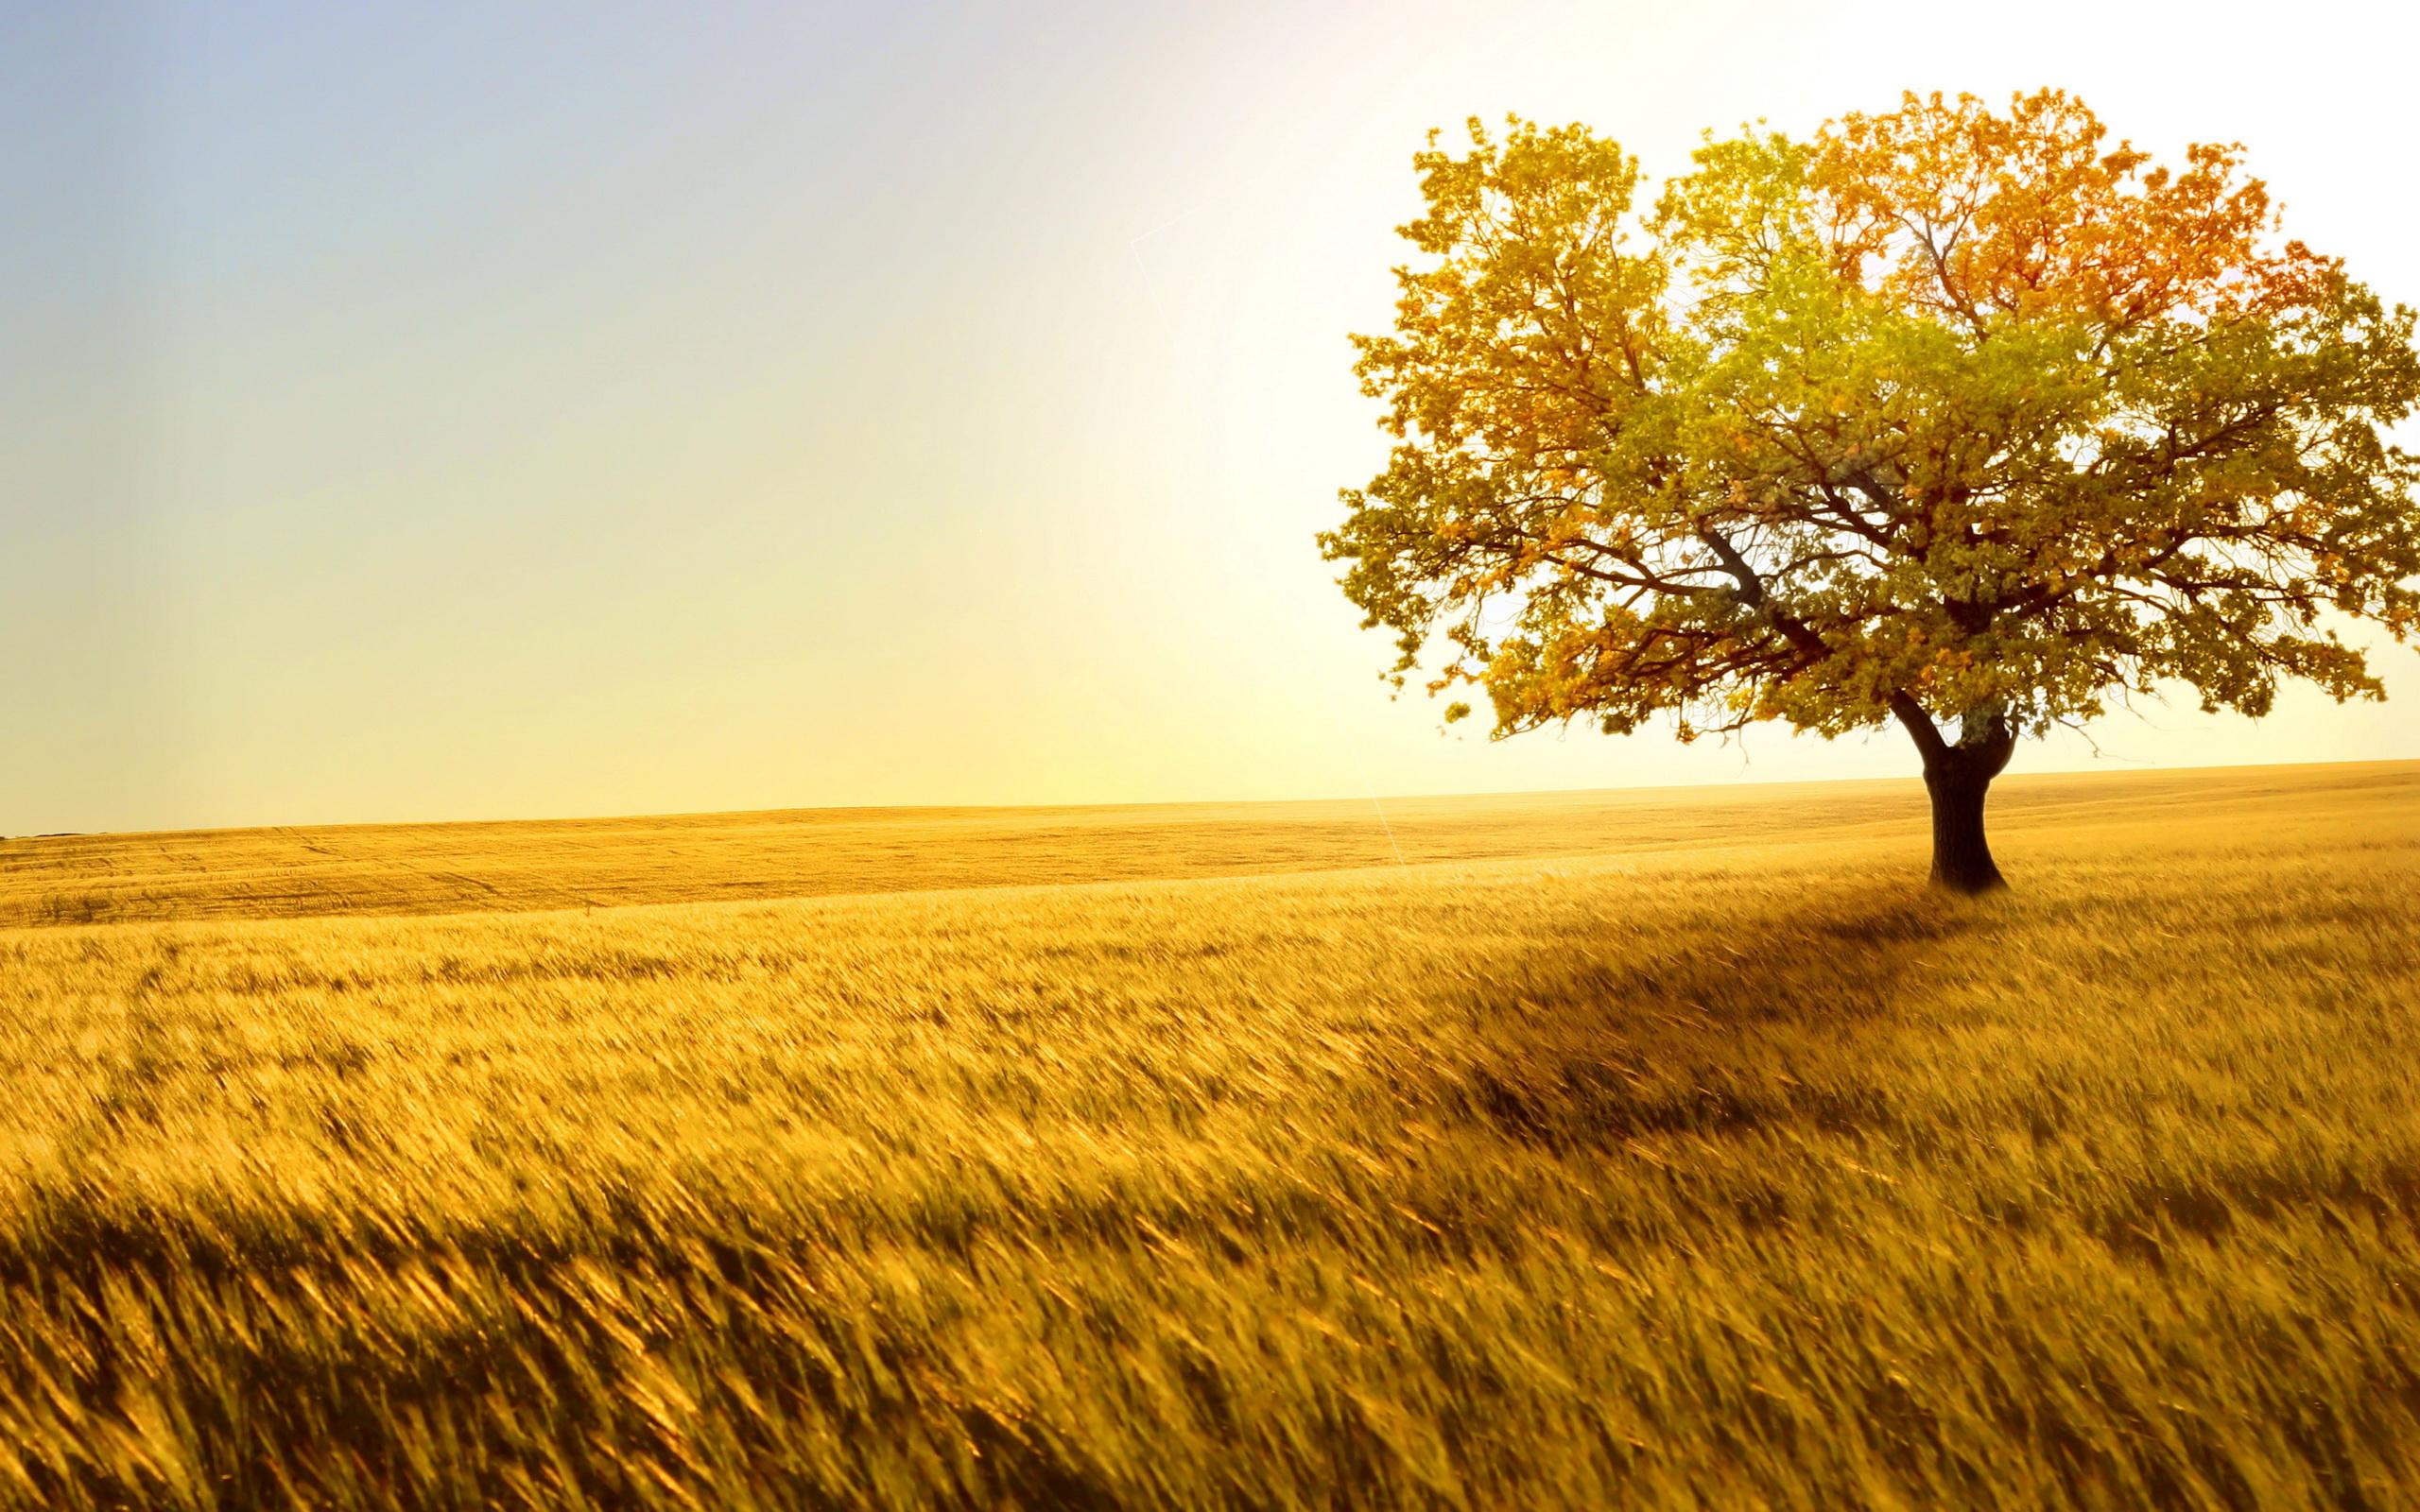 beautiful nature wallpapers - 2560x1600 - 1413081